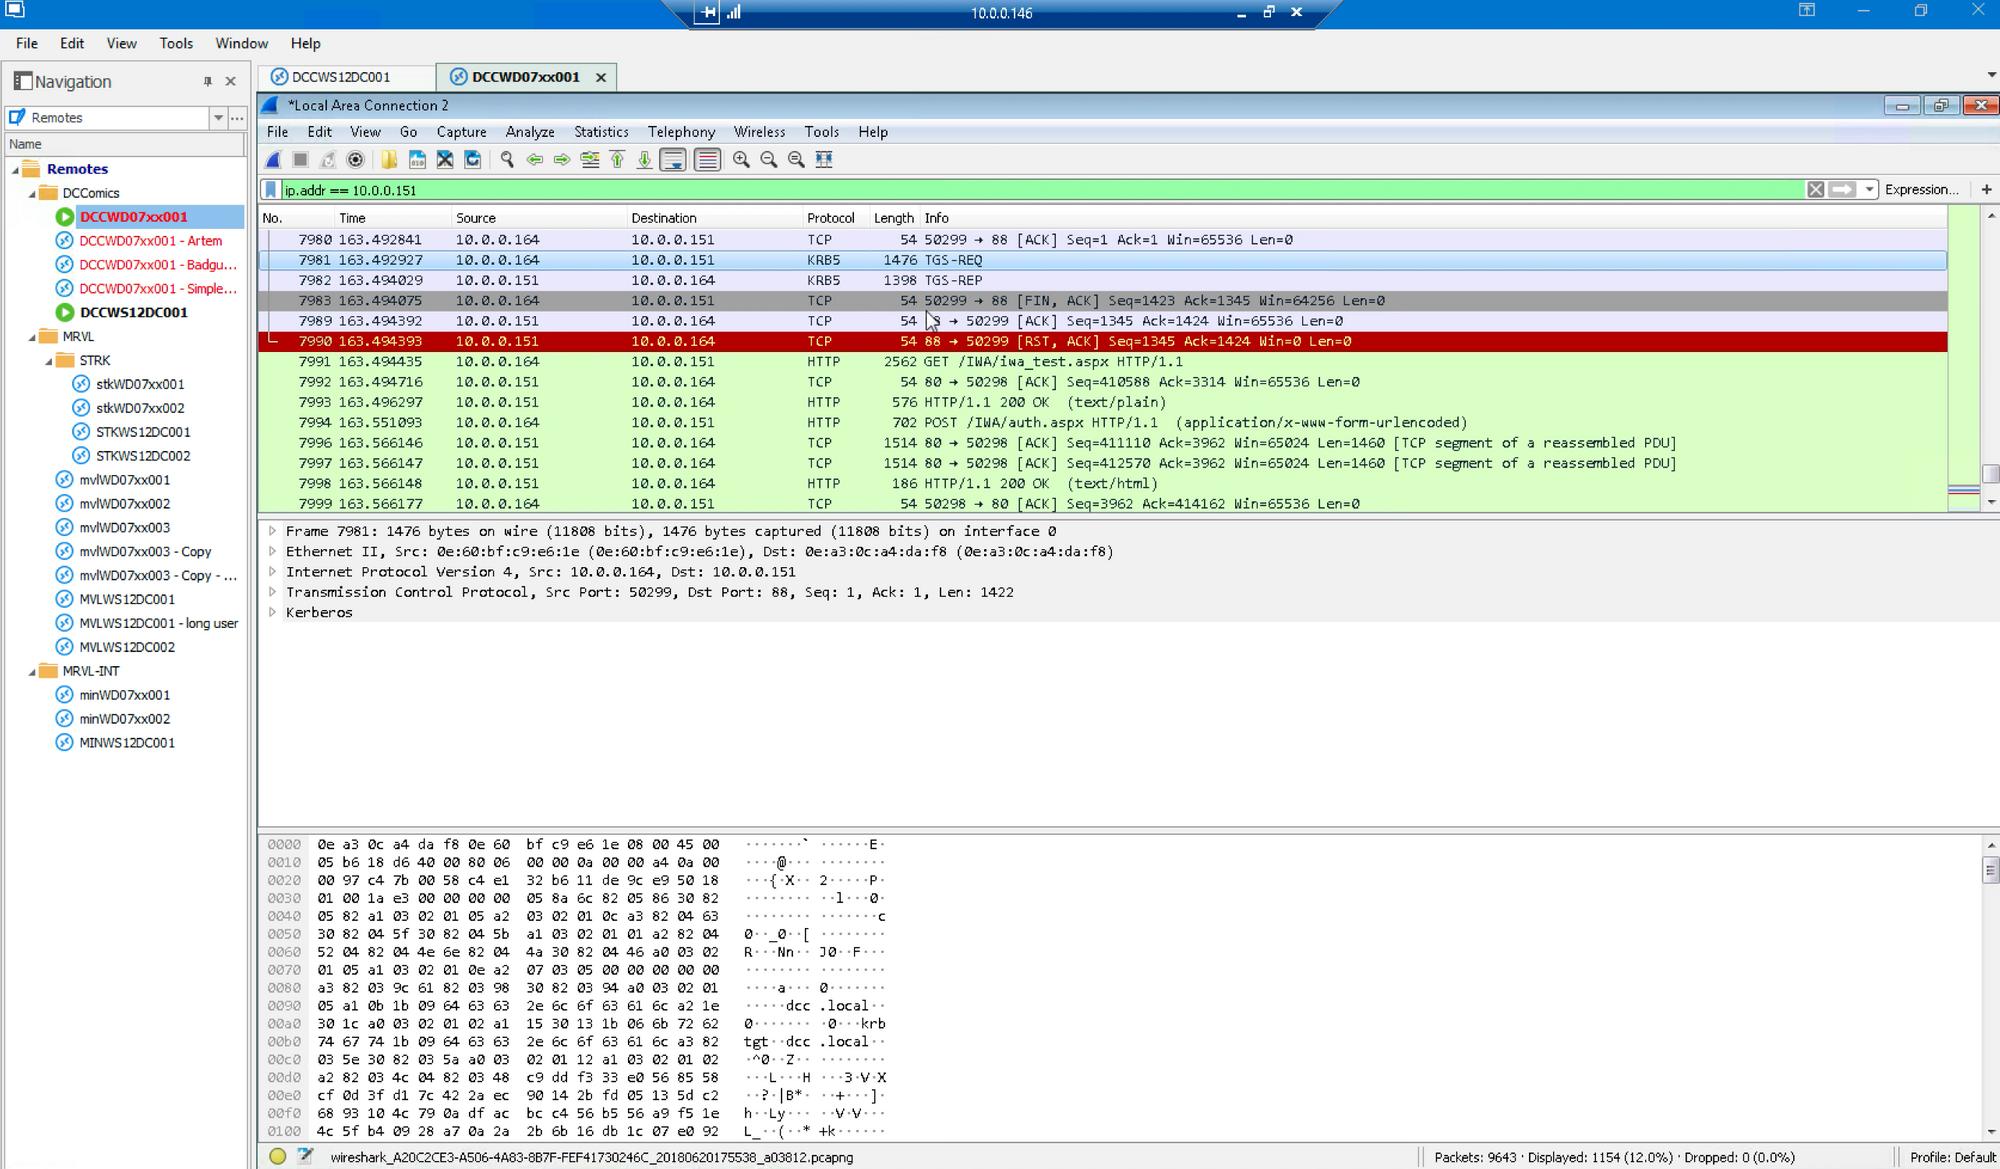 wireshark logs show TGS_REQ